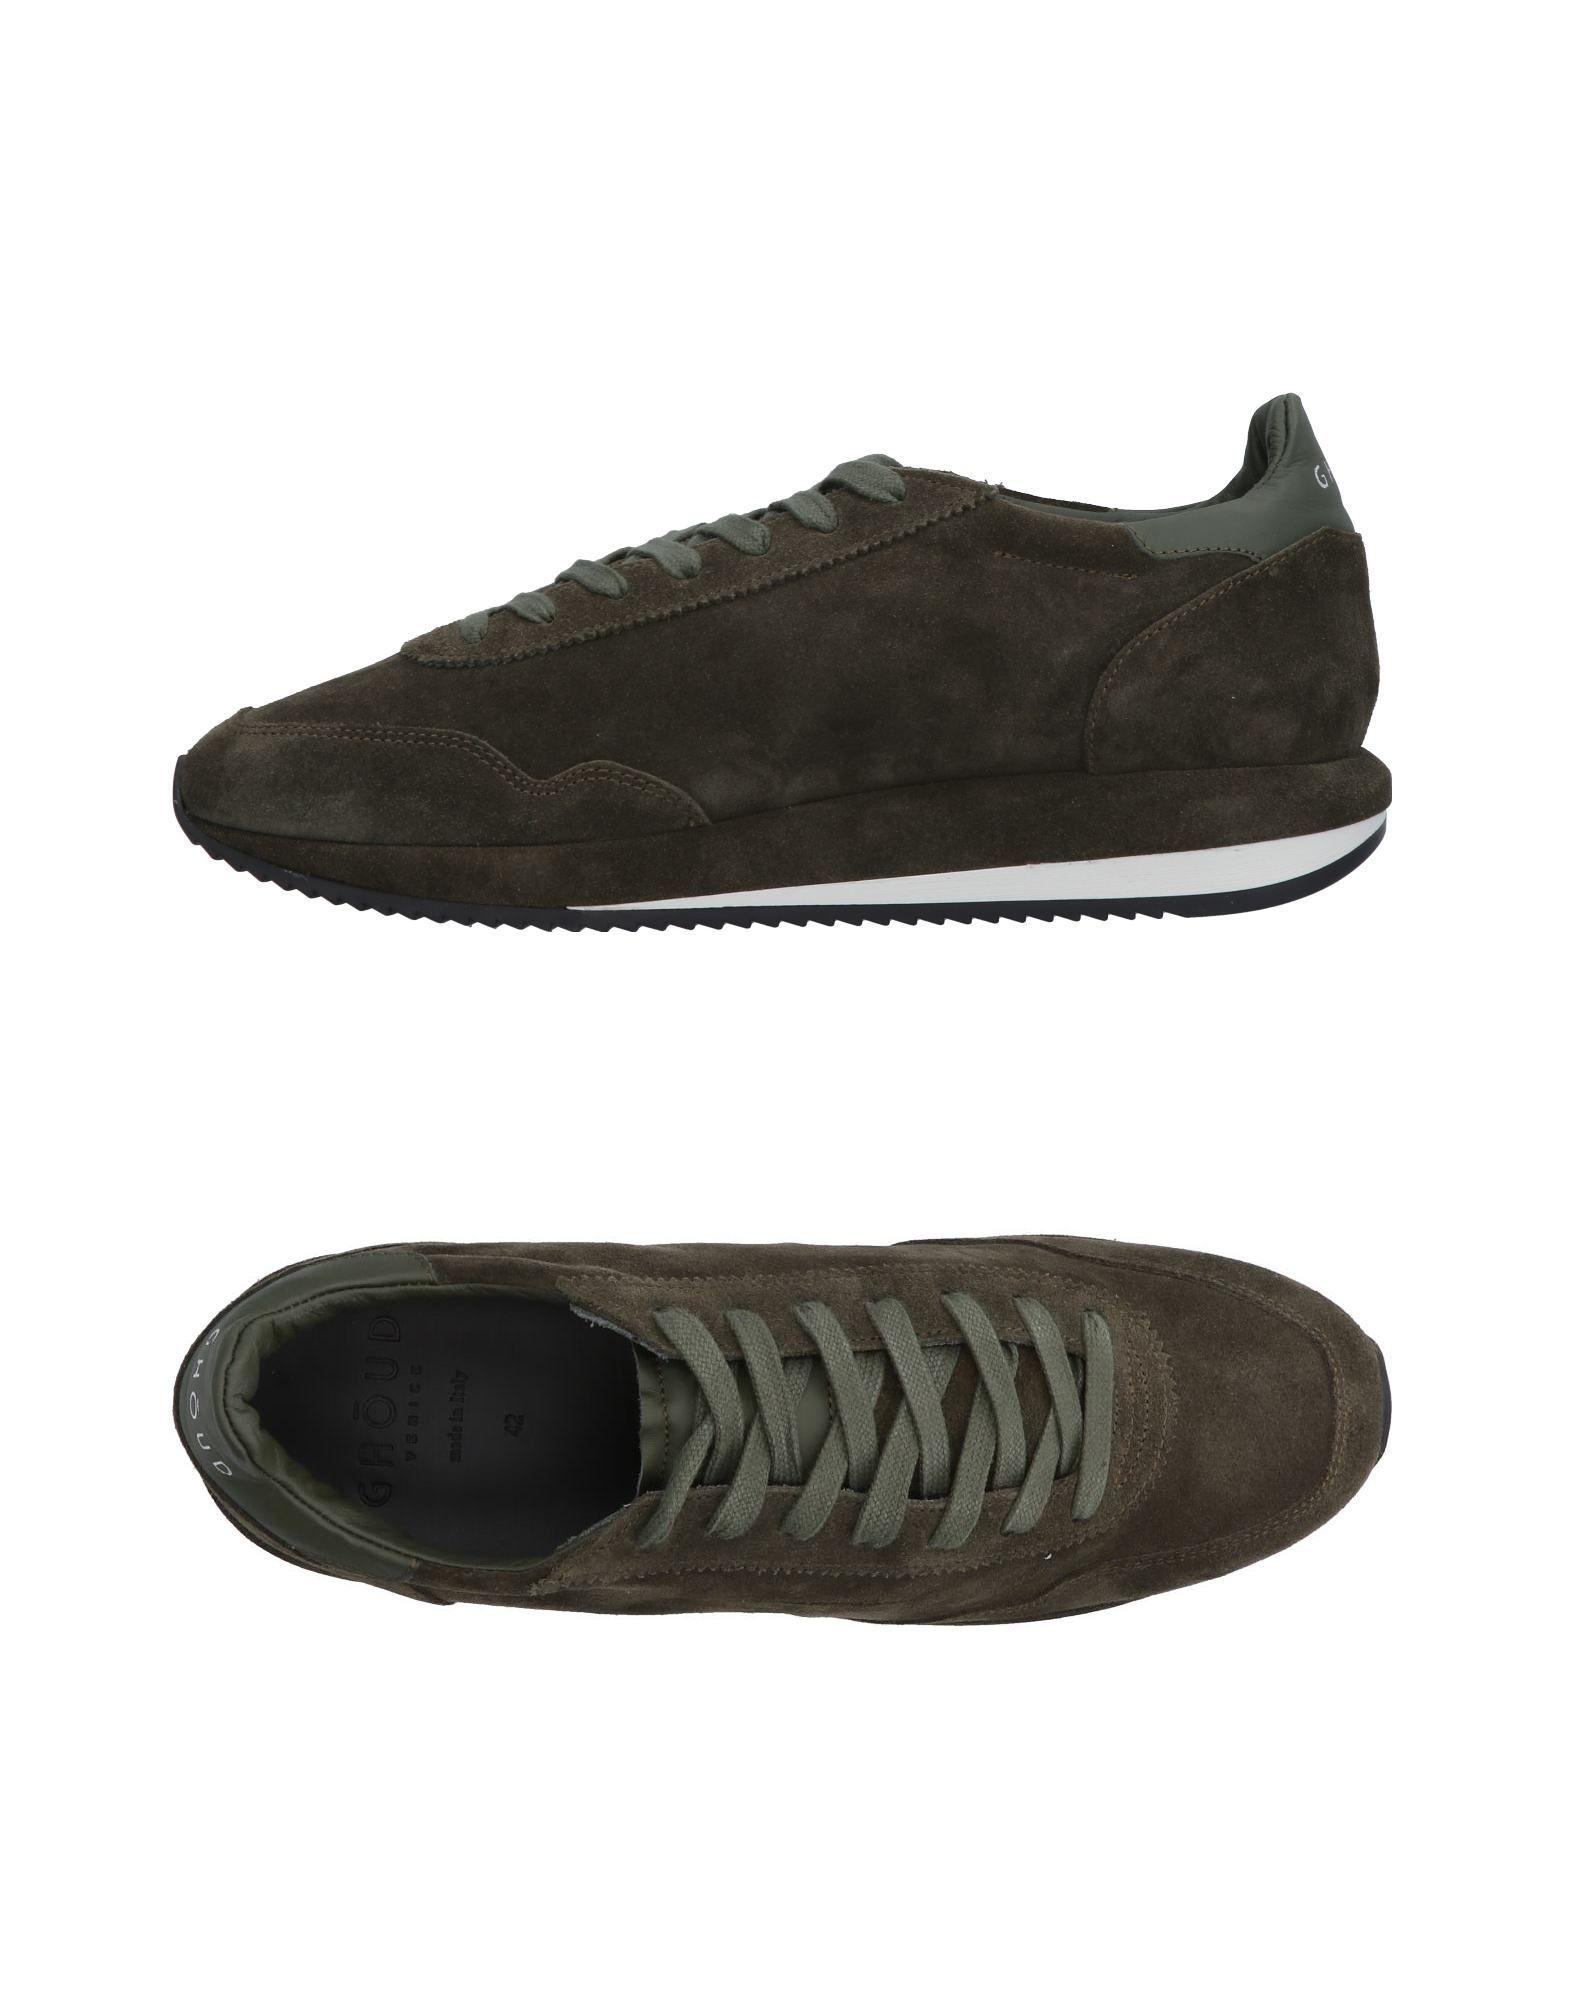 Ghōud Venice Sneakers Herren  11486826OU Gute Qualität beliebte Schuhe